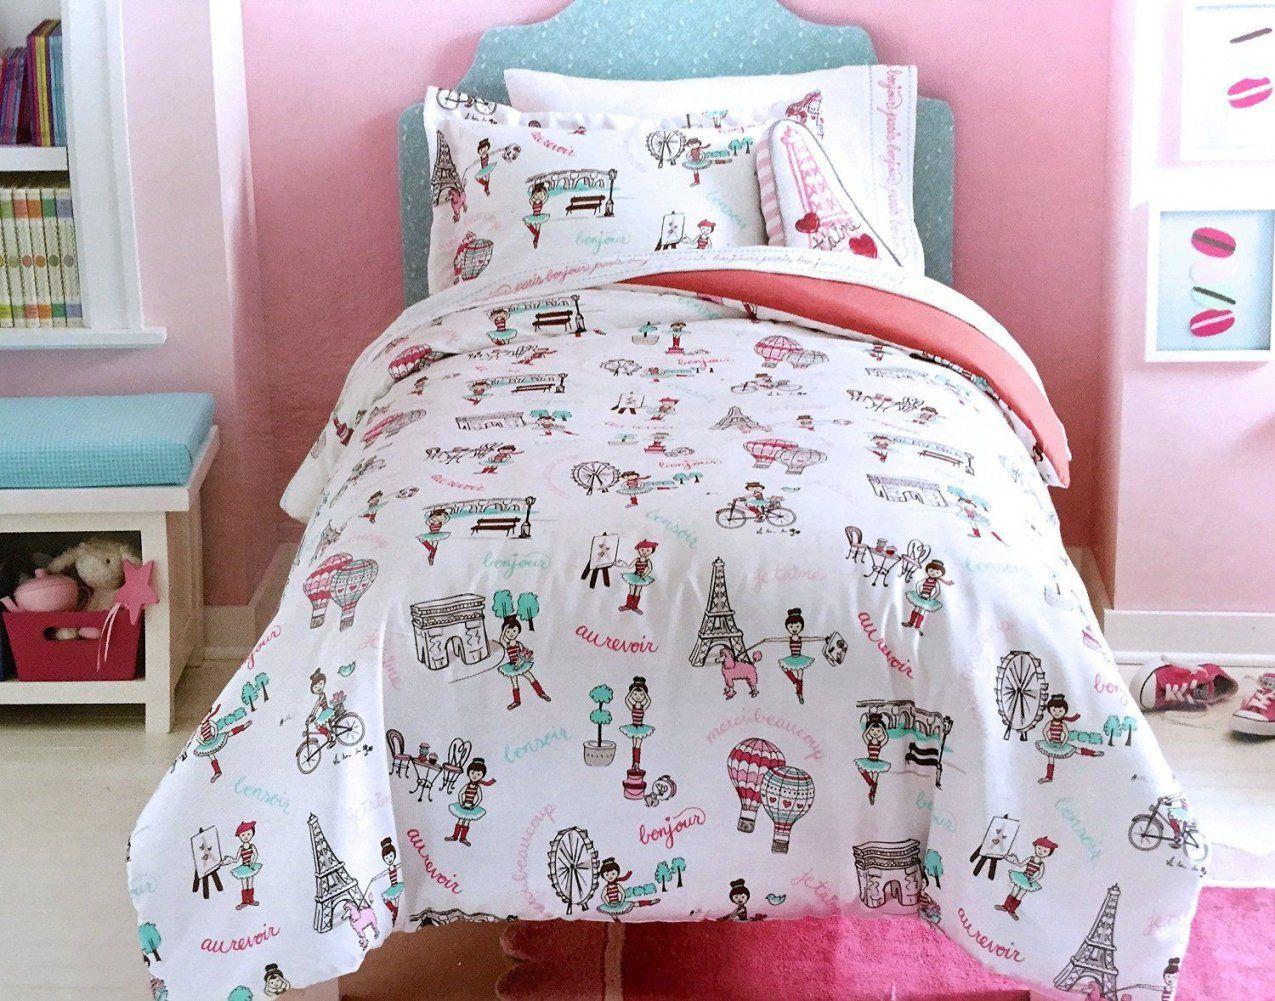 50+ Little Girl Paris Themed Room  Space Saving Bedroom Ideas Check von Girls Paris Themed Bedding Bild